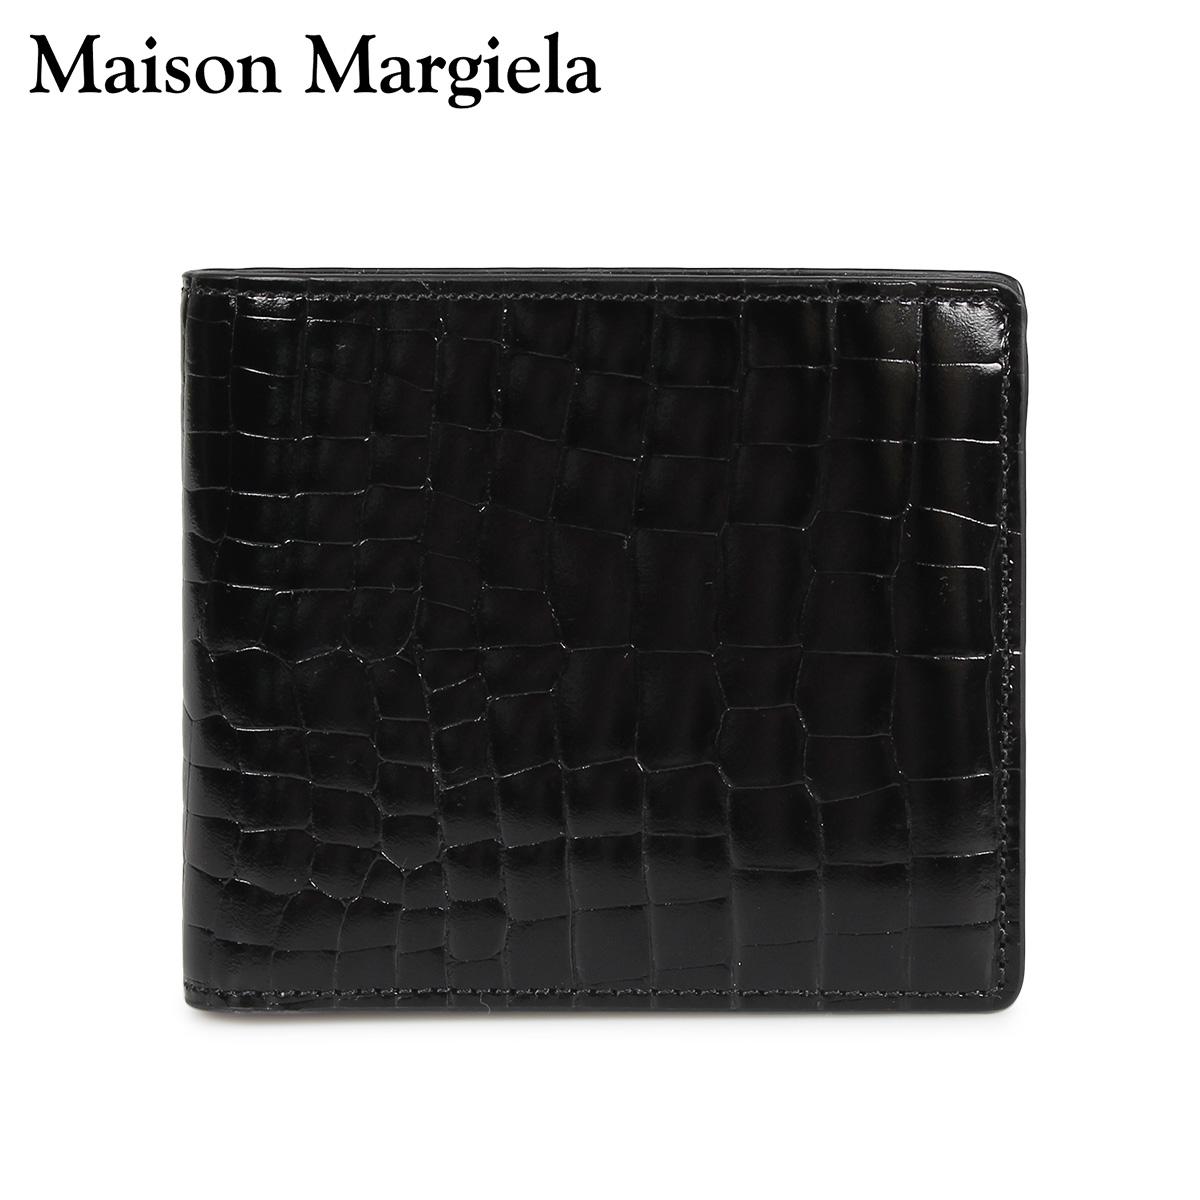 MAISON MARGIELA MINI WALLET メゾンマルジェラ 財布 ミニ財布 二つ折り メンズ レディース レザー ブラック 黒 S35UI0435 P0195 [10/8 新入荷]